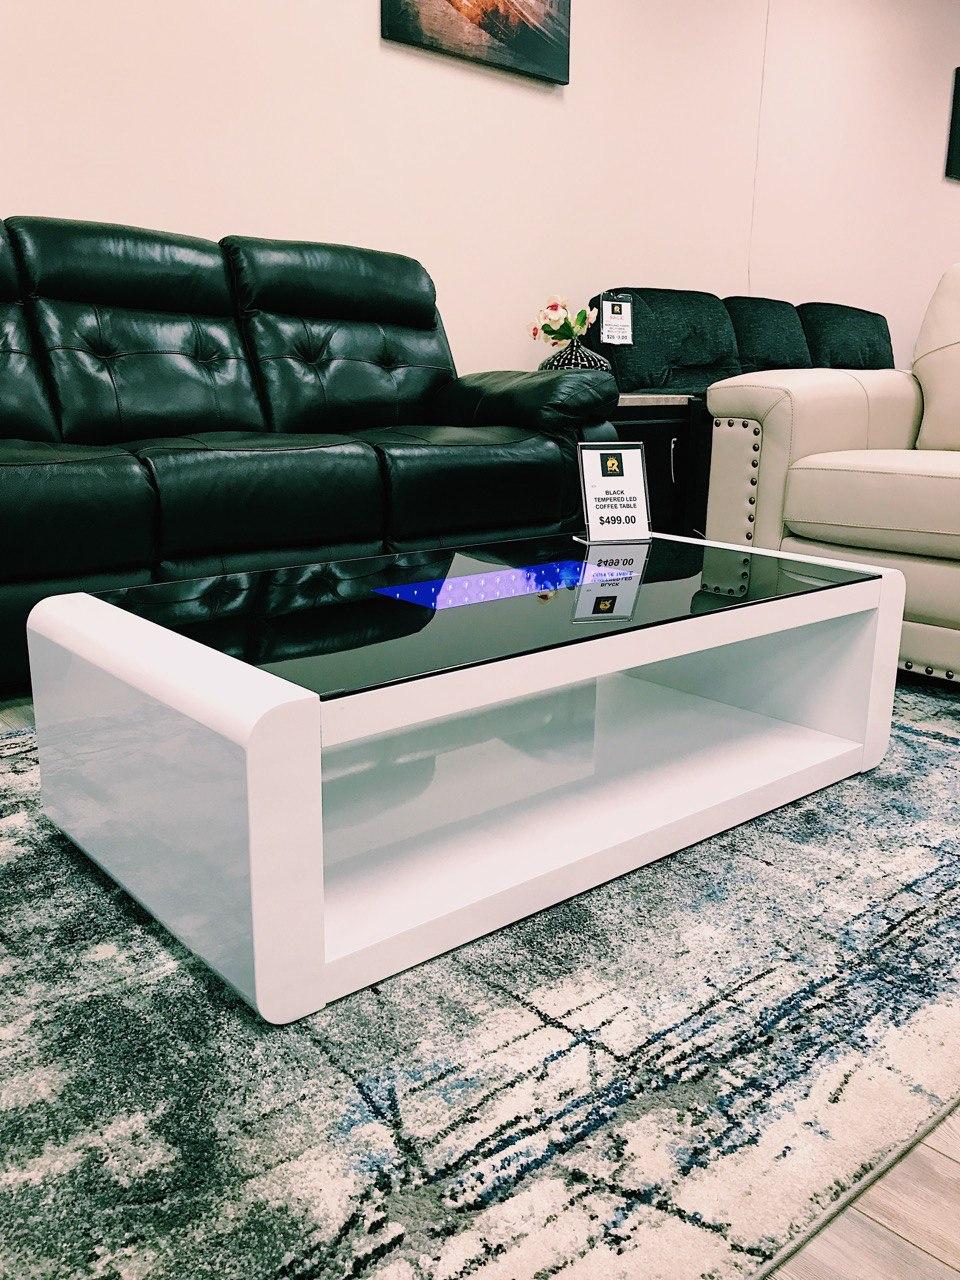 Royal Furniture | furniture store | 945 King Edward St, Winnipeg, MB R3H 0P8, Canada | 4315885005 OR +1 431-588-5005